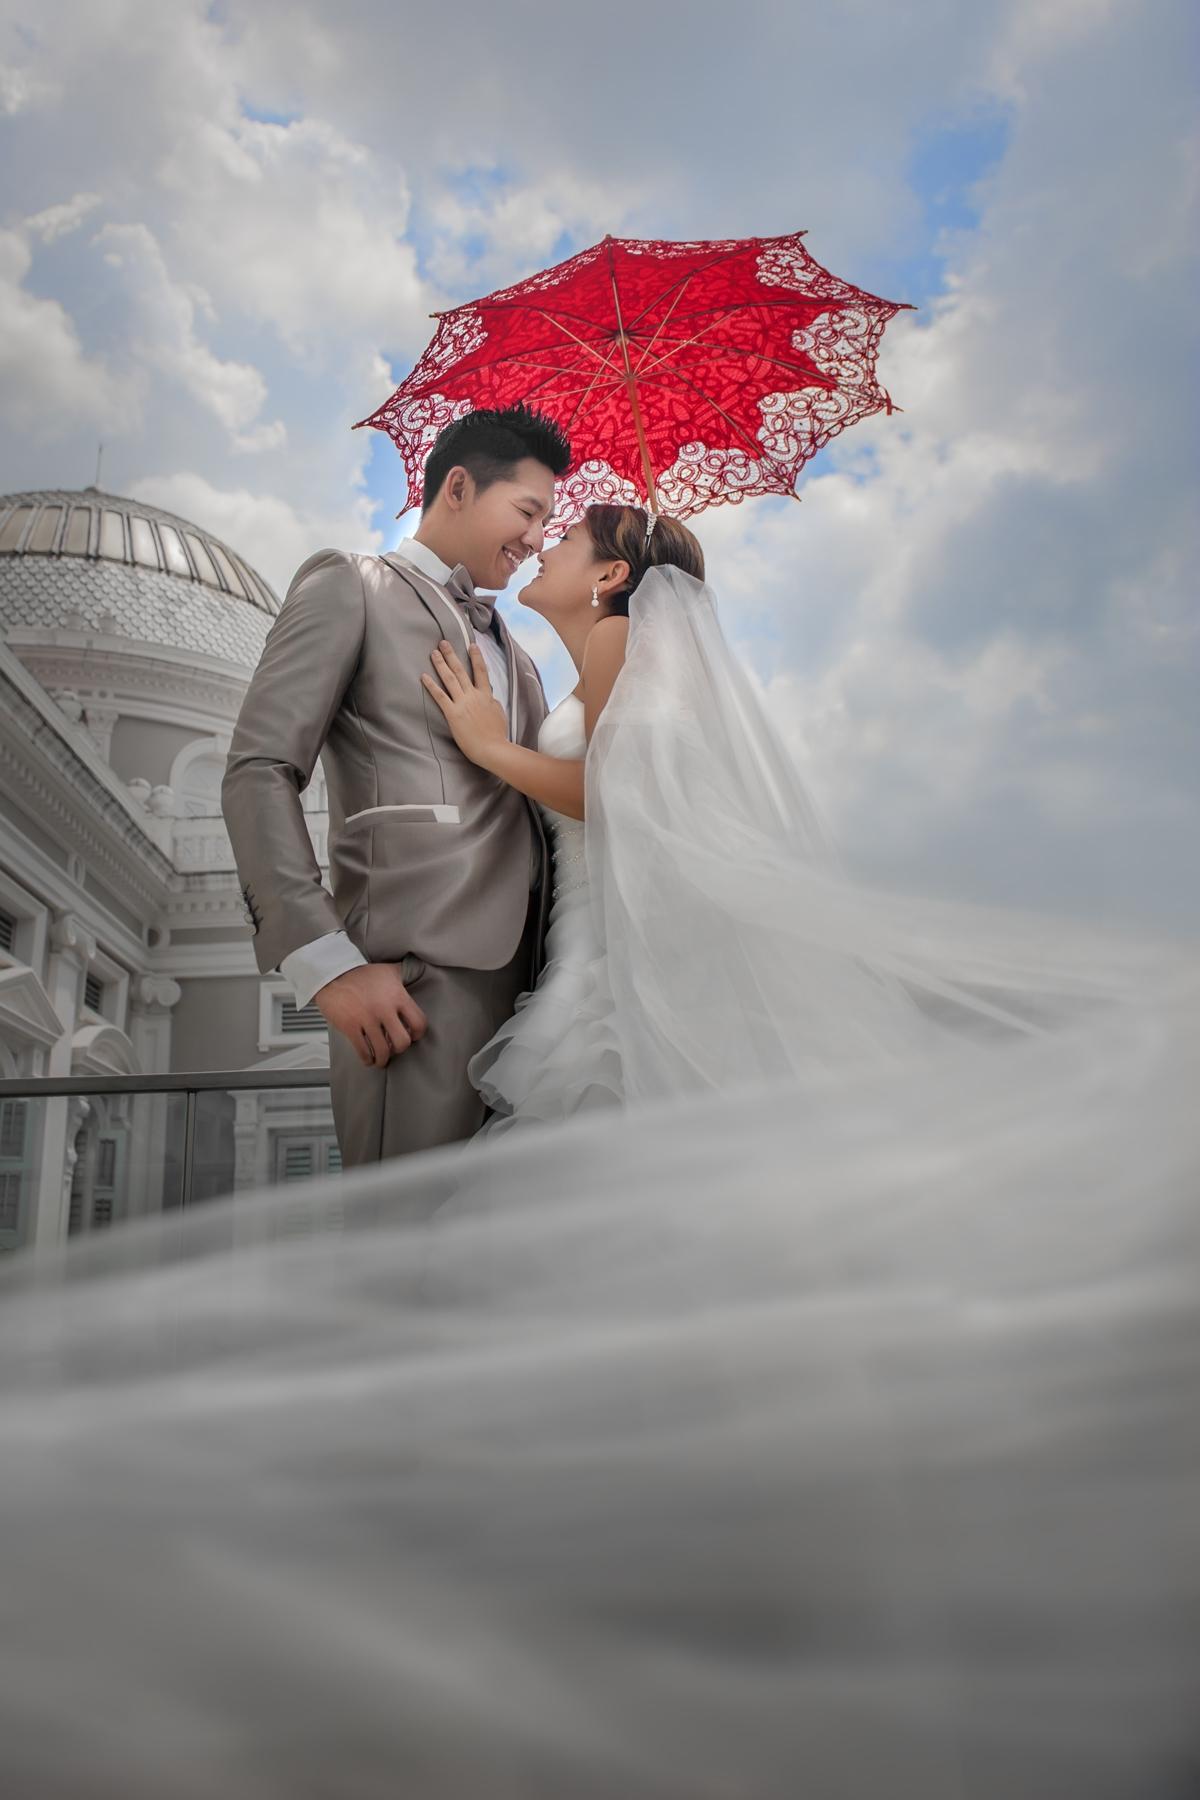 An amazing veil